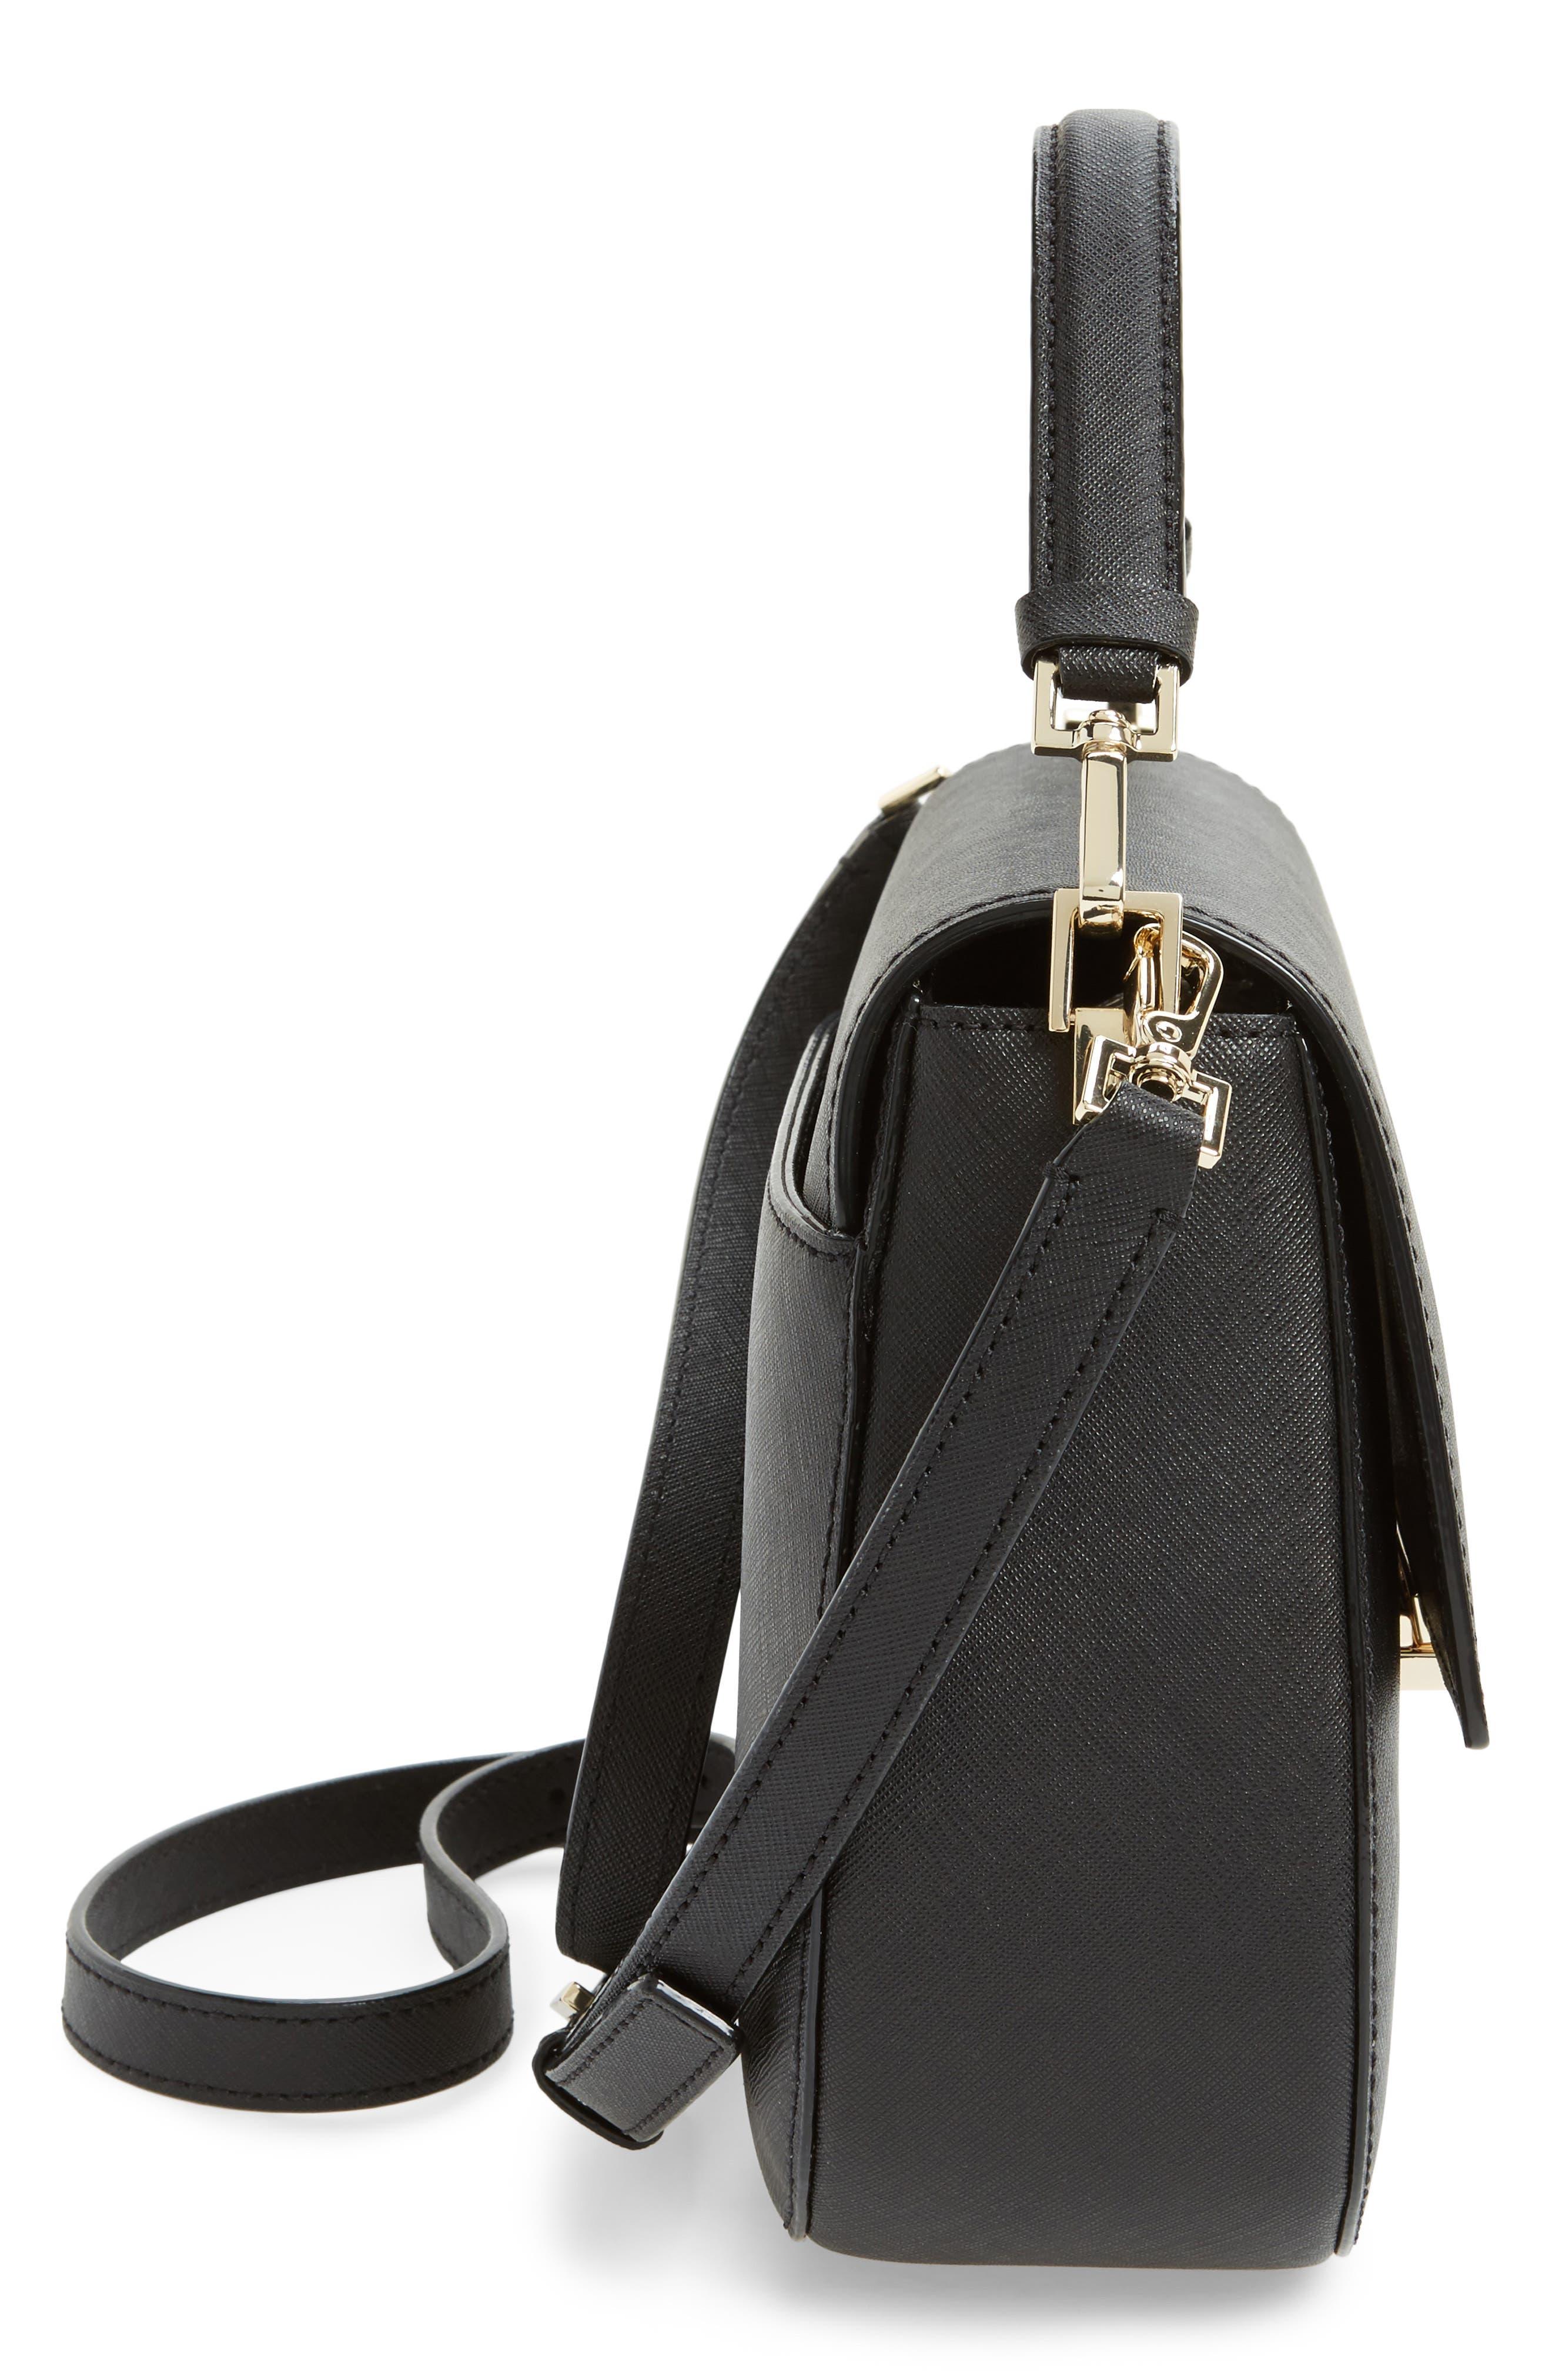 make it mine - byrdie leather saddle bag,                             Alternate thumbnail 4, color,                             Black